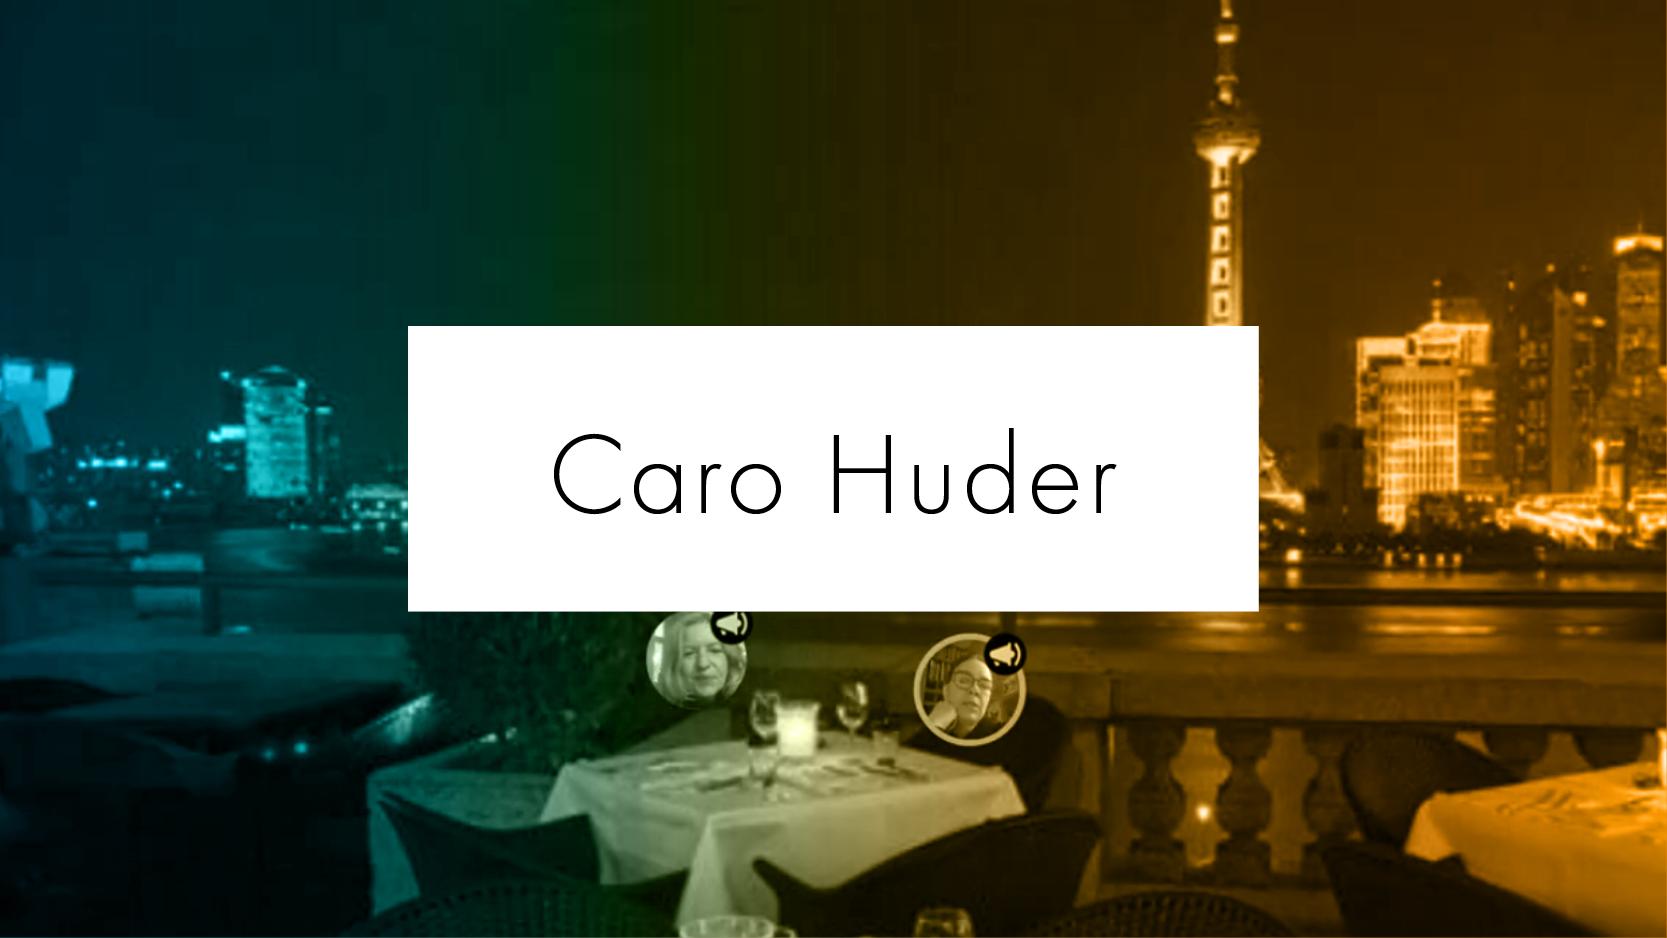 Caro Huder